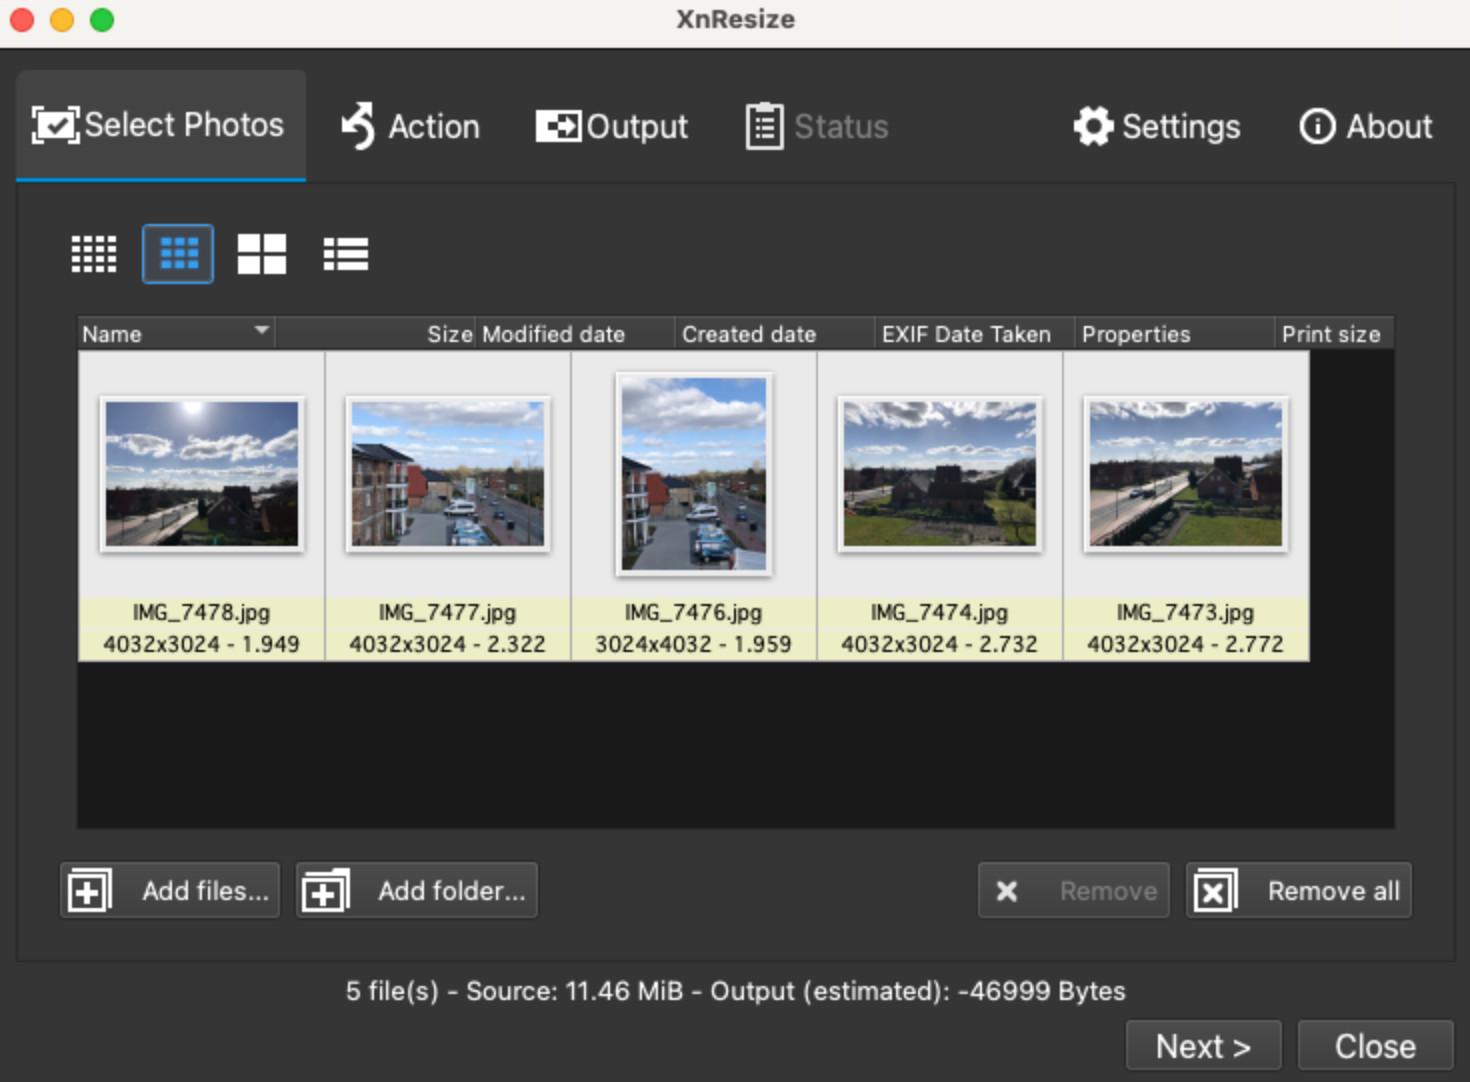 Screenshot 1 - XnResize (Mac)